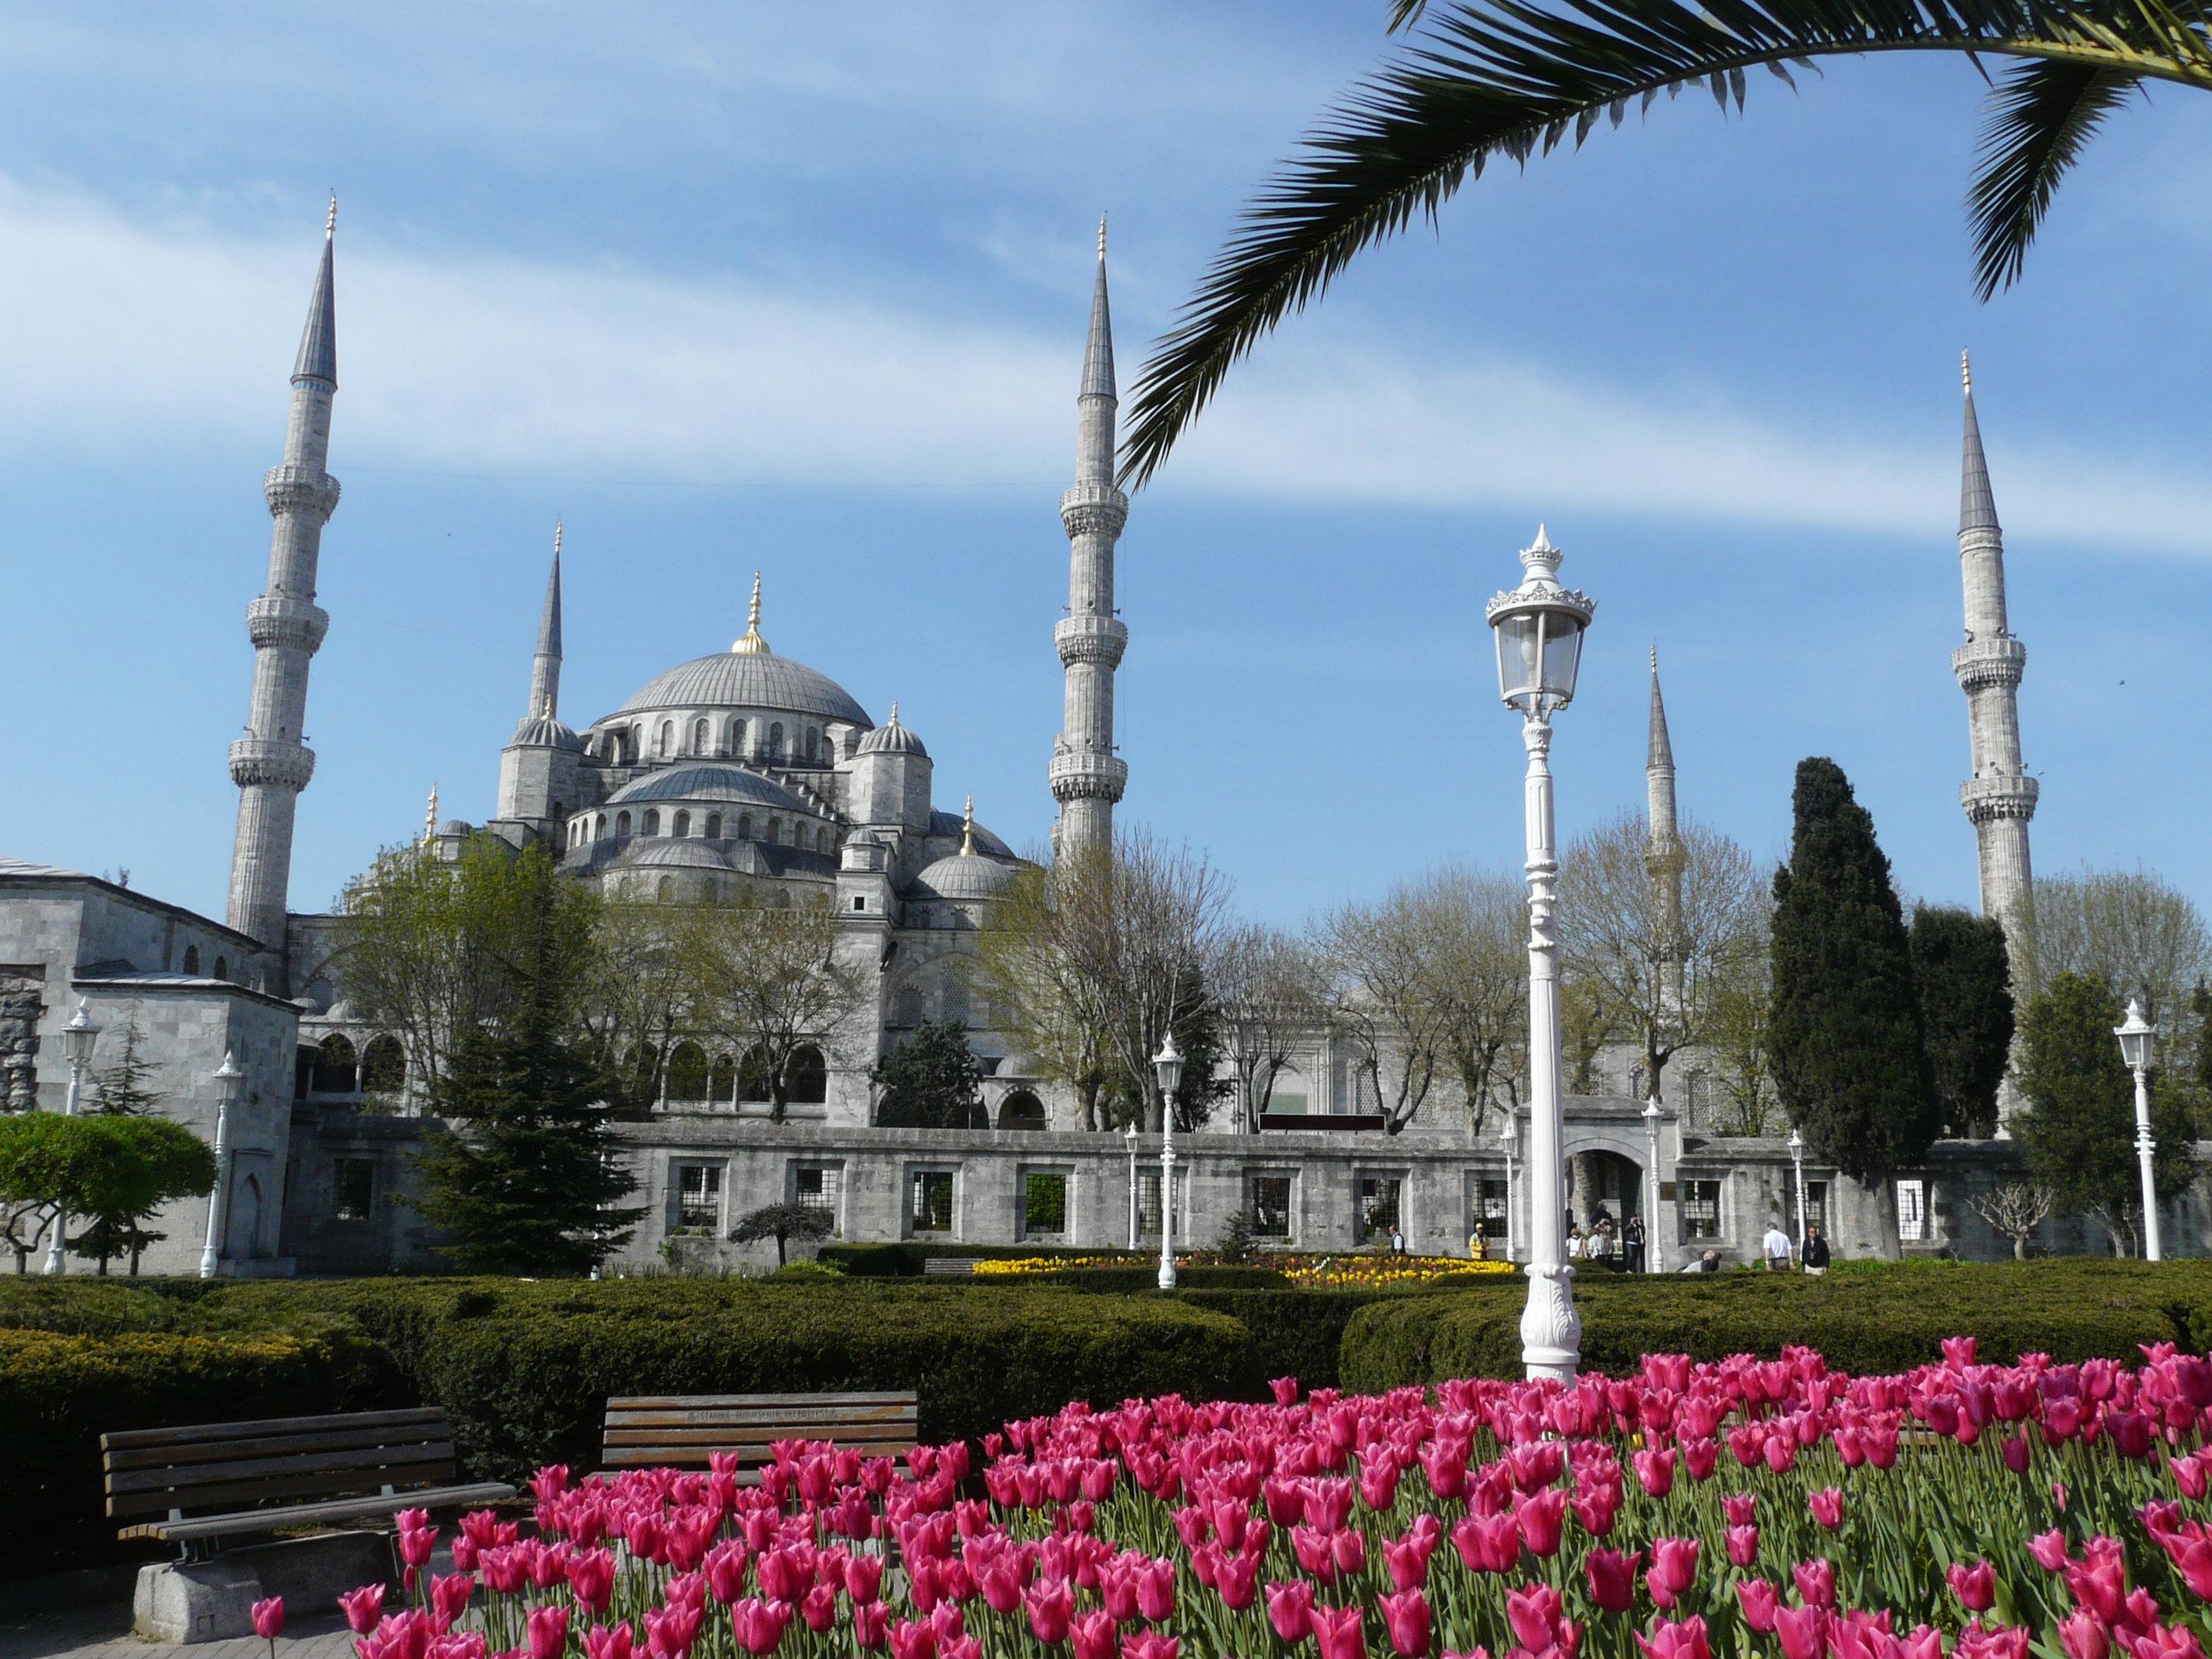 Blue_mosque_Istanbul_2009_04_21_-2.jpg